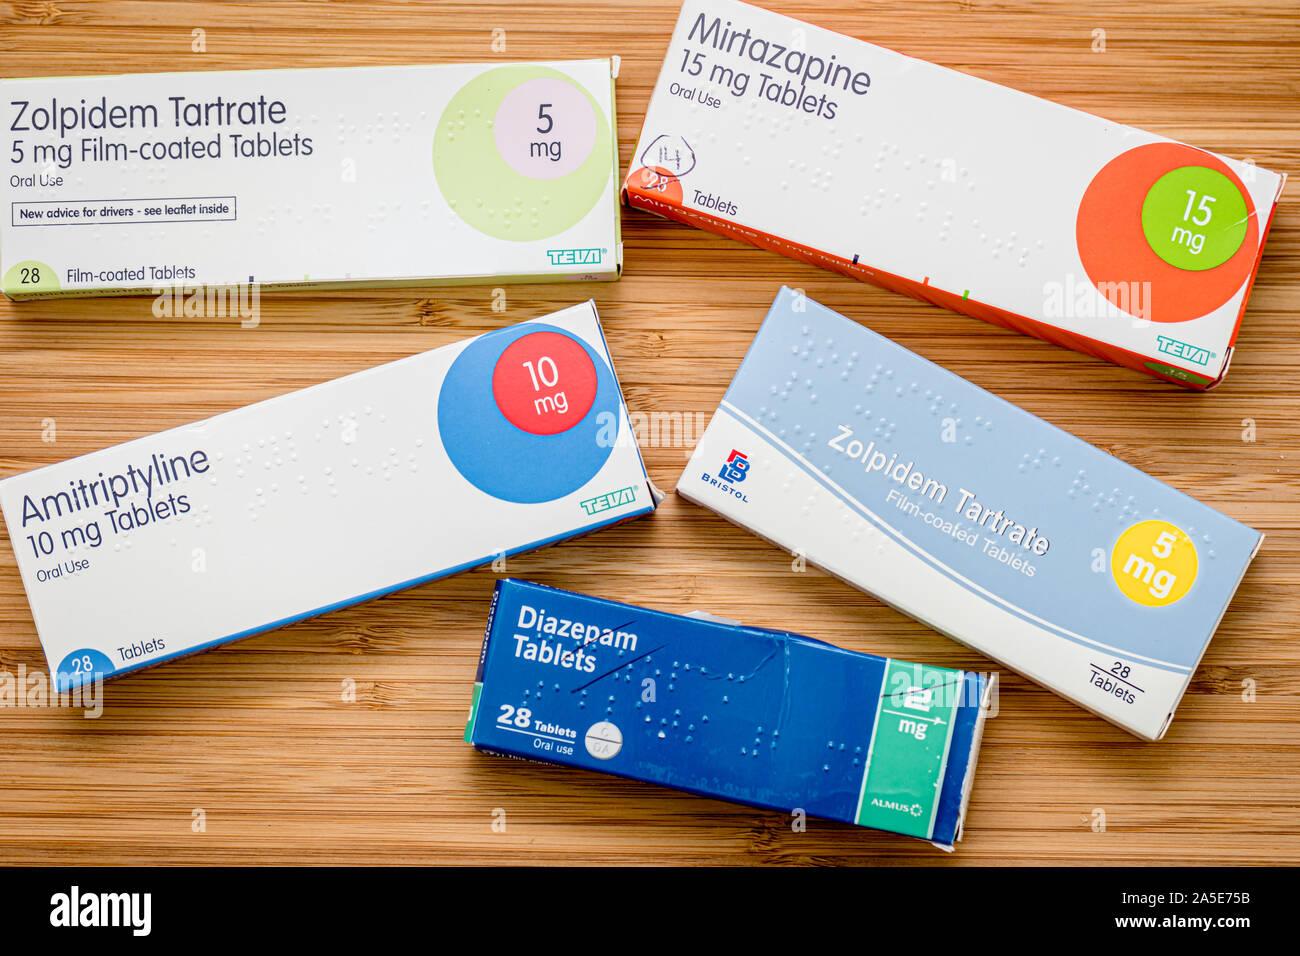 plaquenil manufacturer coupon